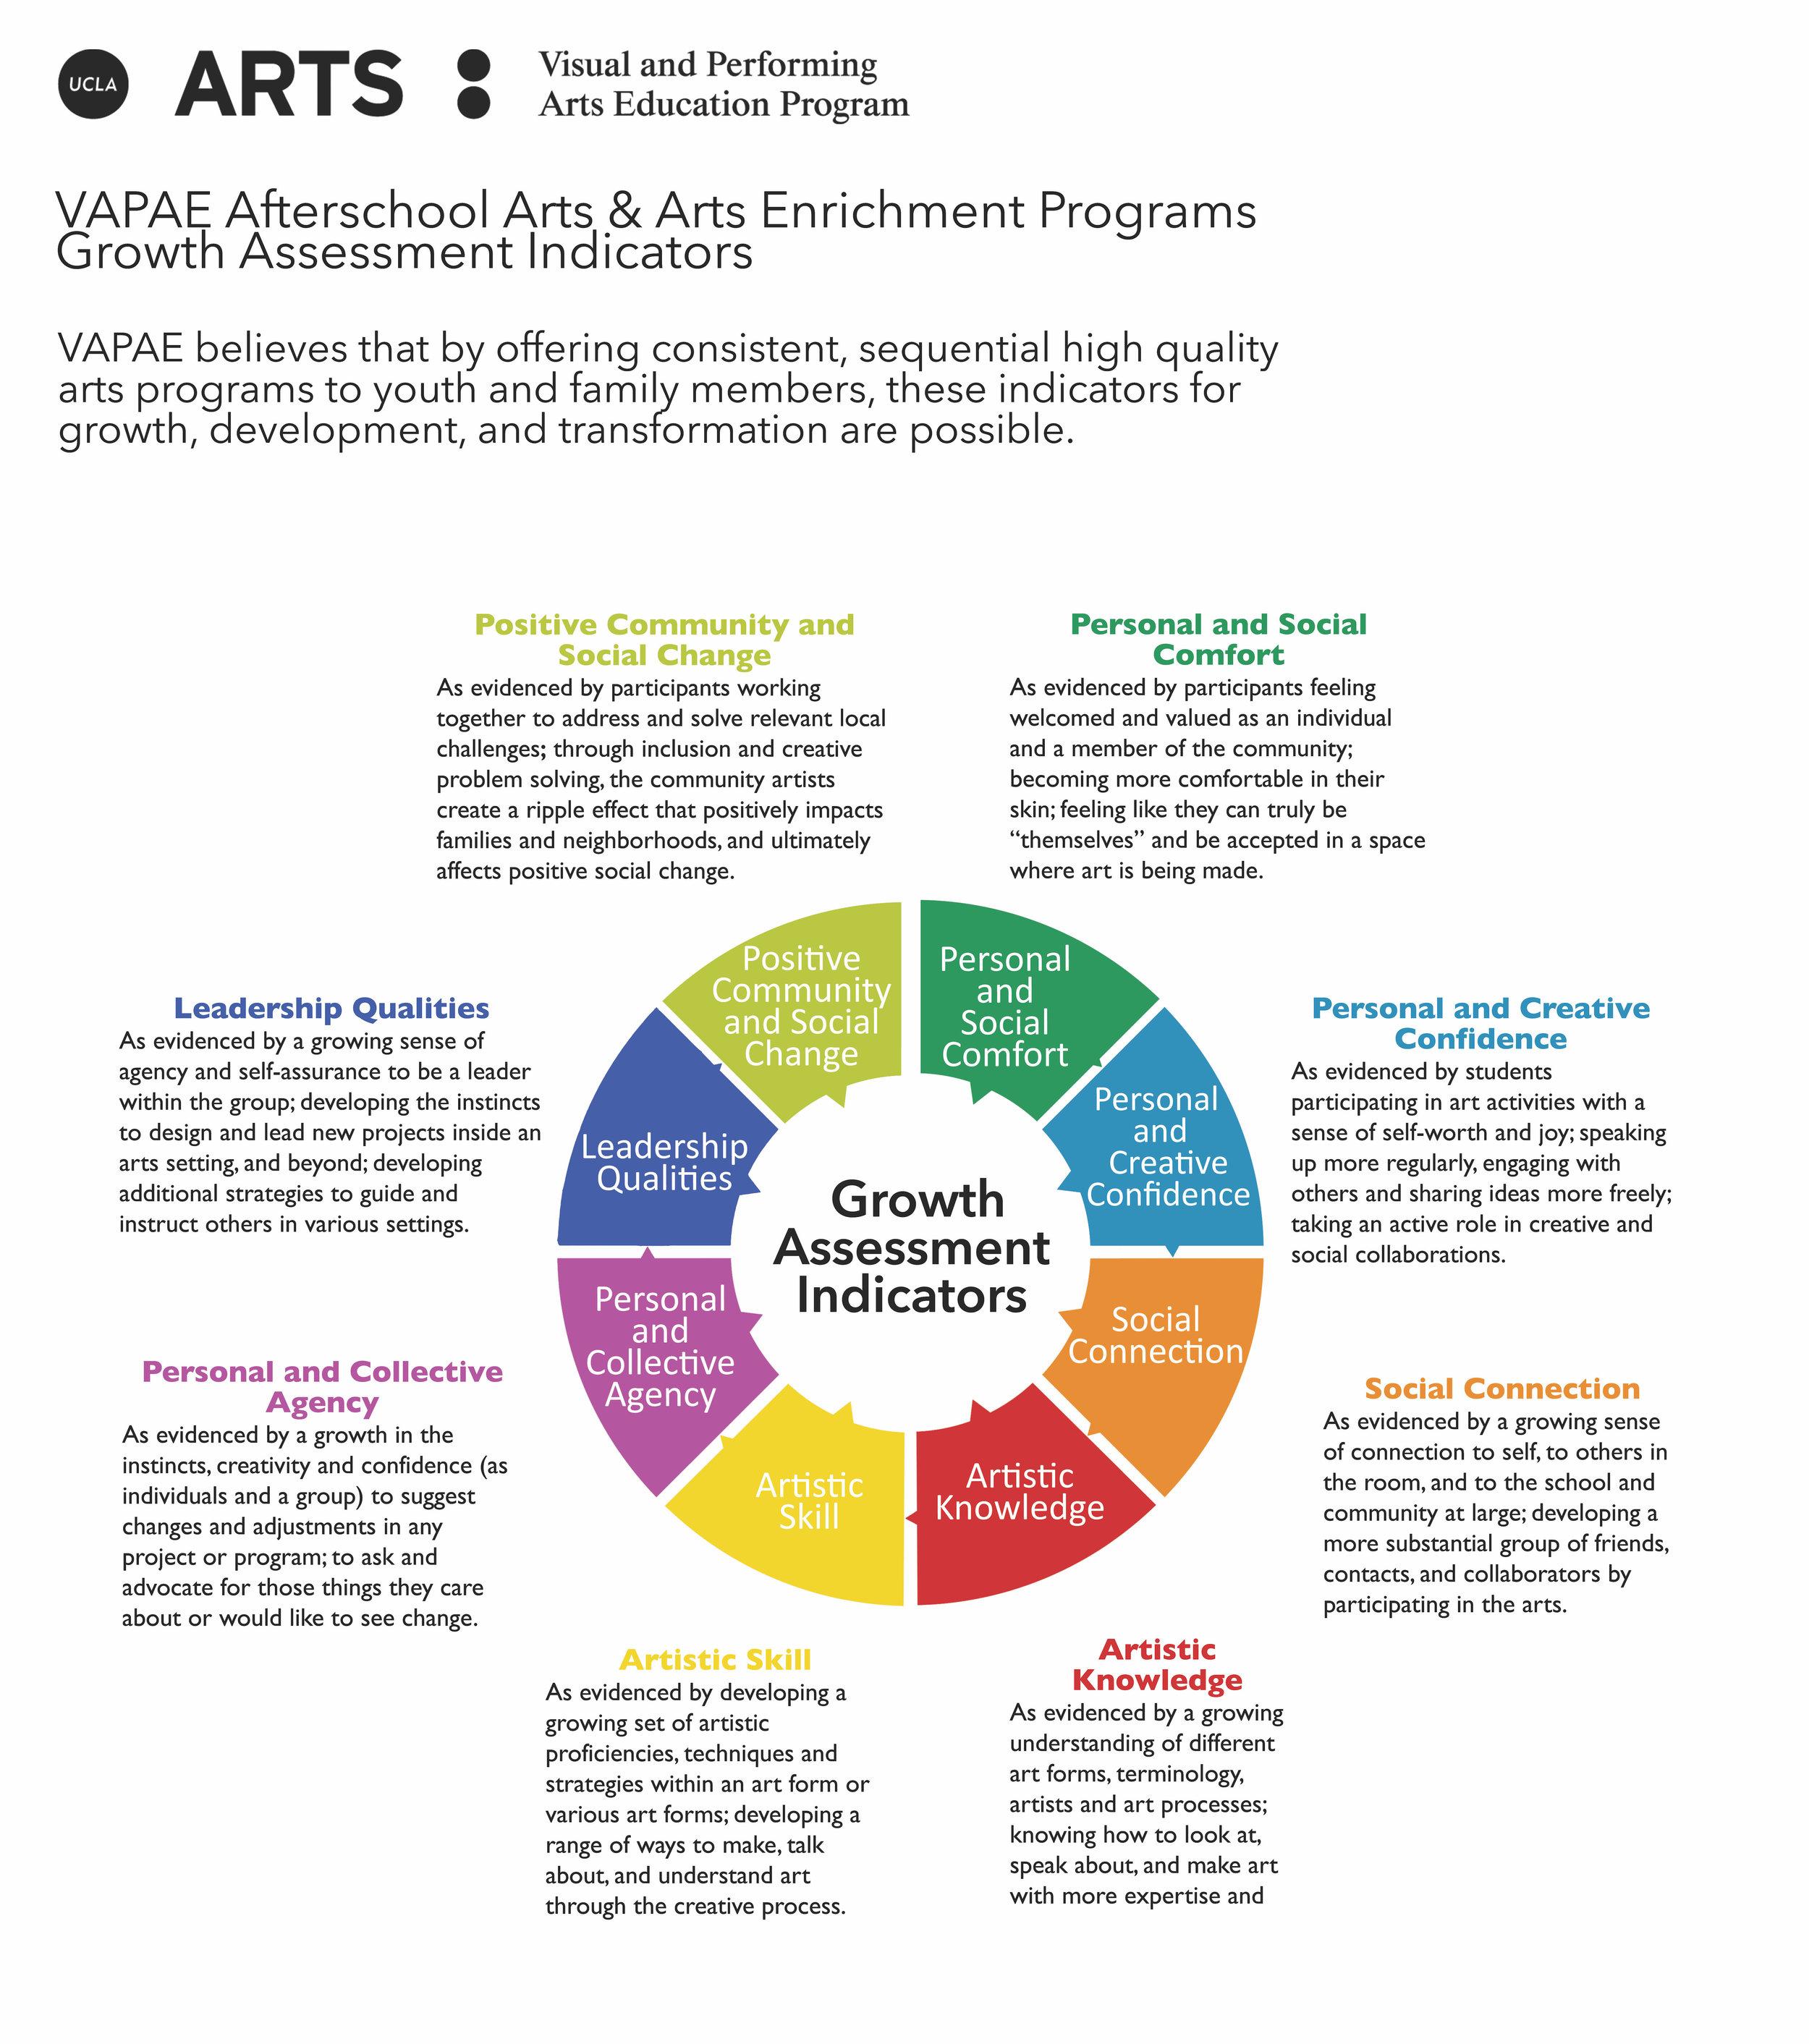 Growth Indicators Infographic 4.17.18.jpg